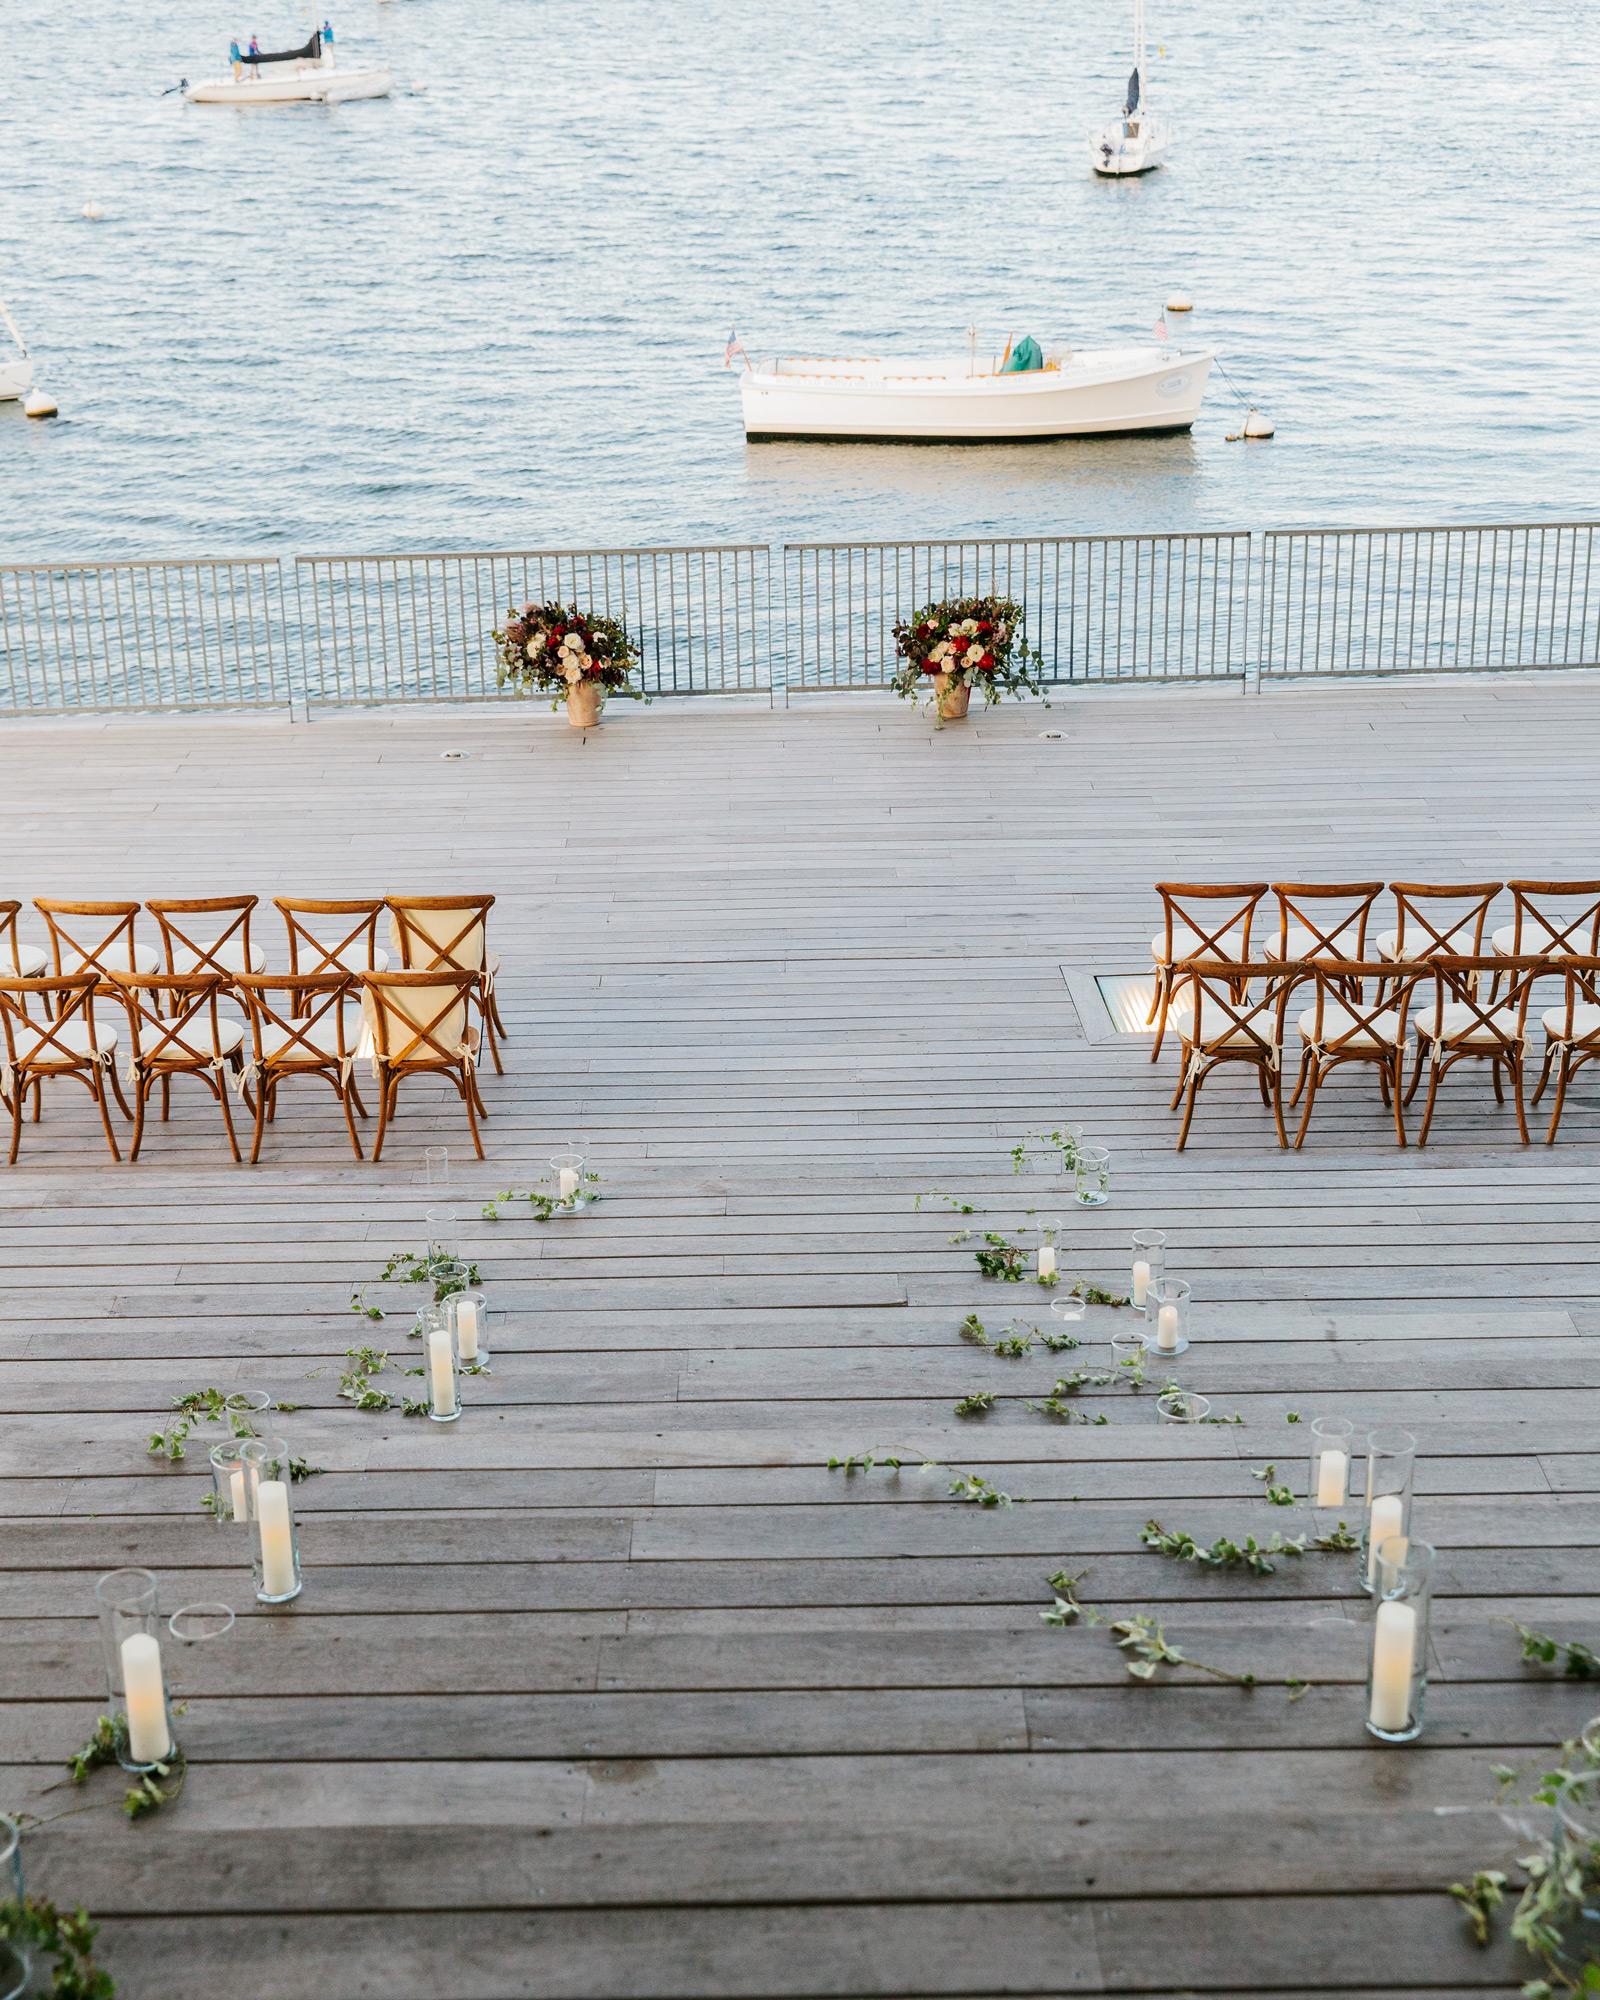 danielle-brian-wedding-ceremony-outdoor-0798-s113001-0616.jpg